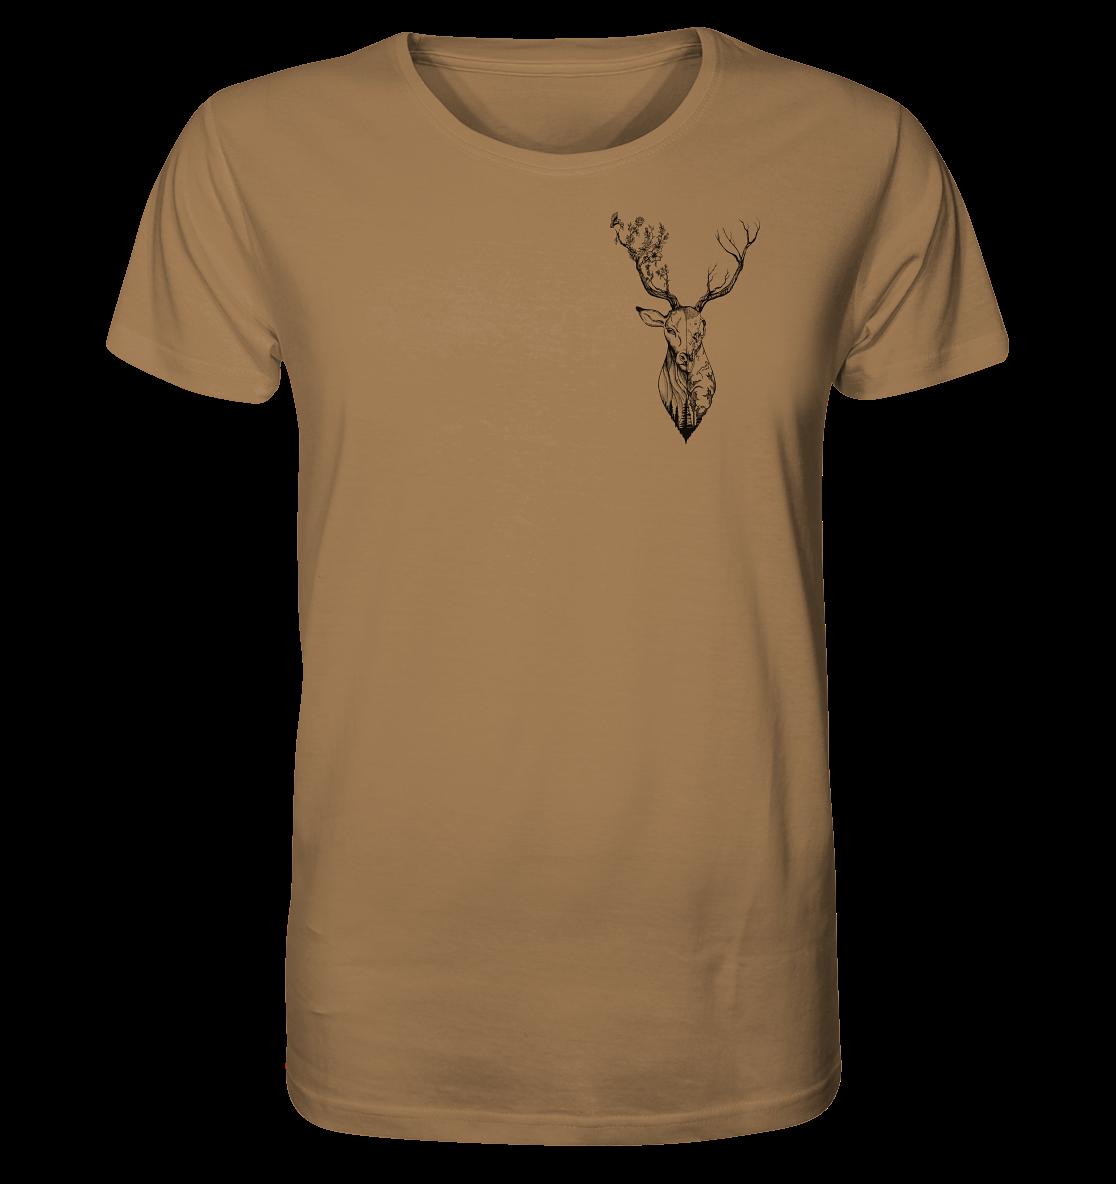 front-organic-shirt-a17c55-1116x-13.png